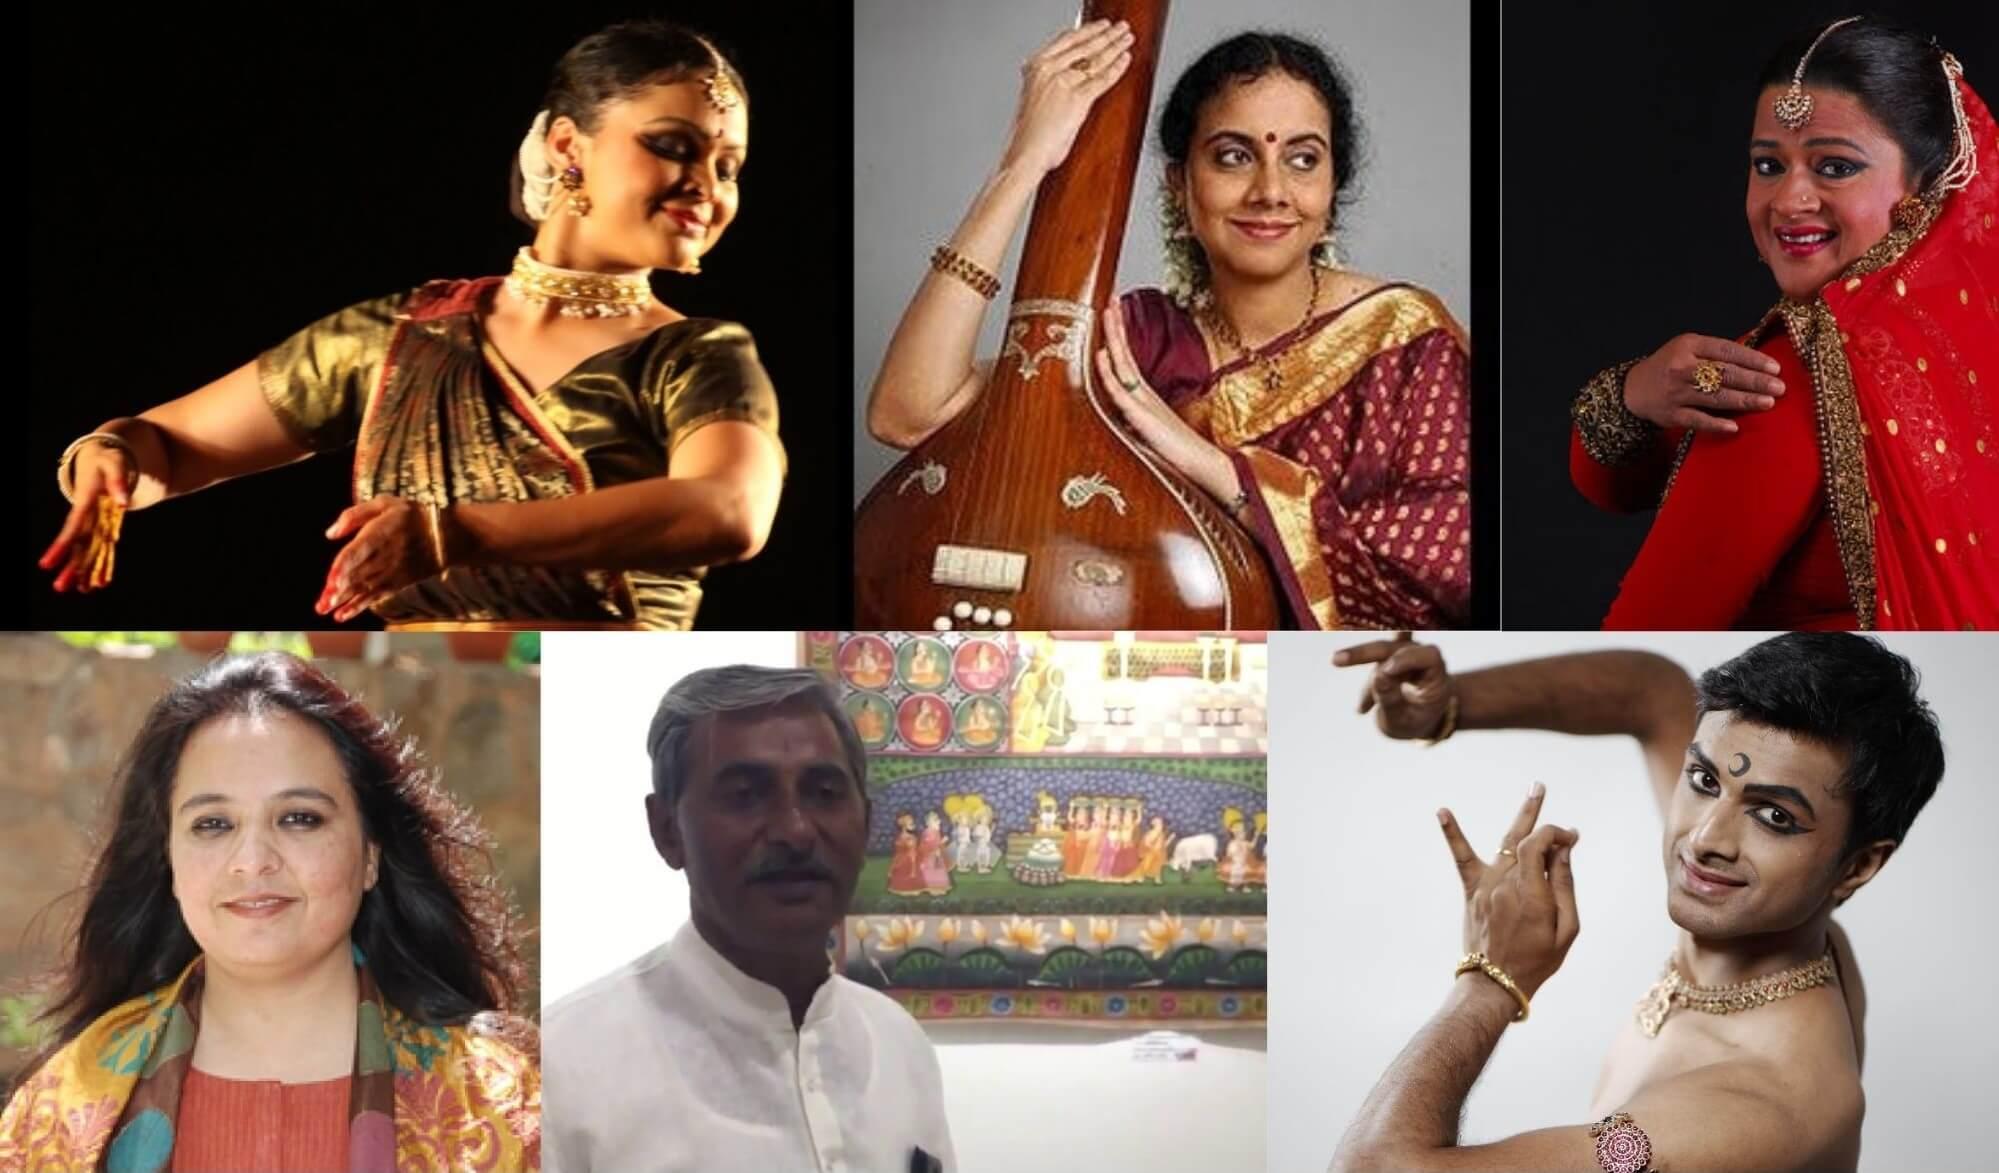 (L-R, clockwise) Gauri Diwakar, Gayathri Girish, Rani Khanam, Parshwanath Upadhye, Kaalyanml Sahu and Qamar Dagar who took part in the Spic Macay event. Source: YouTube and artistes' websites